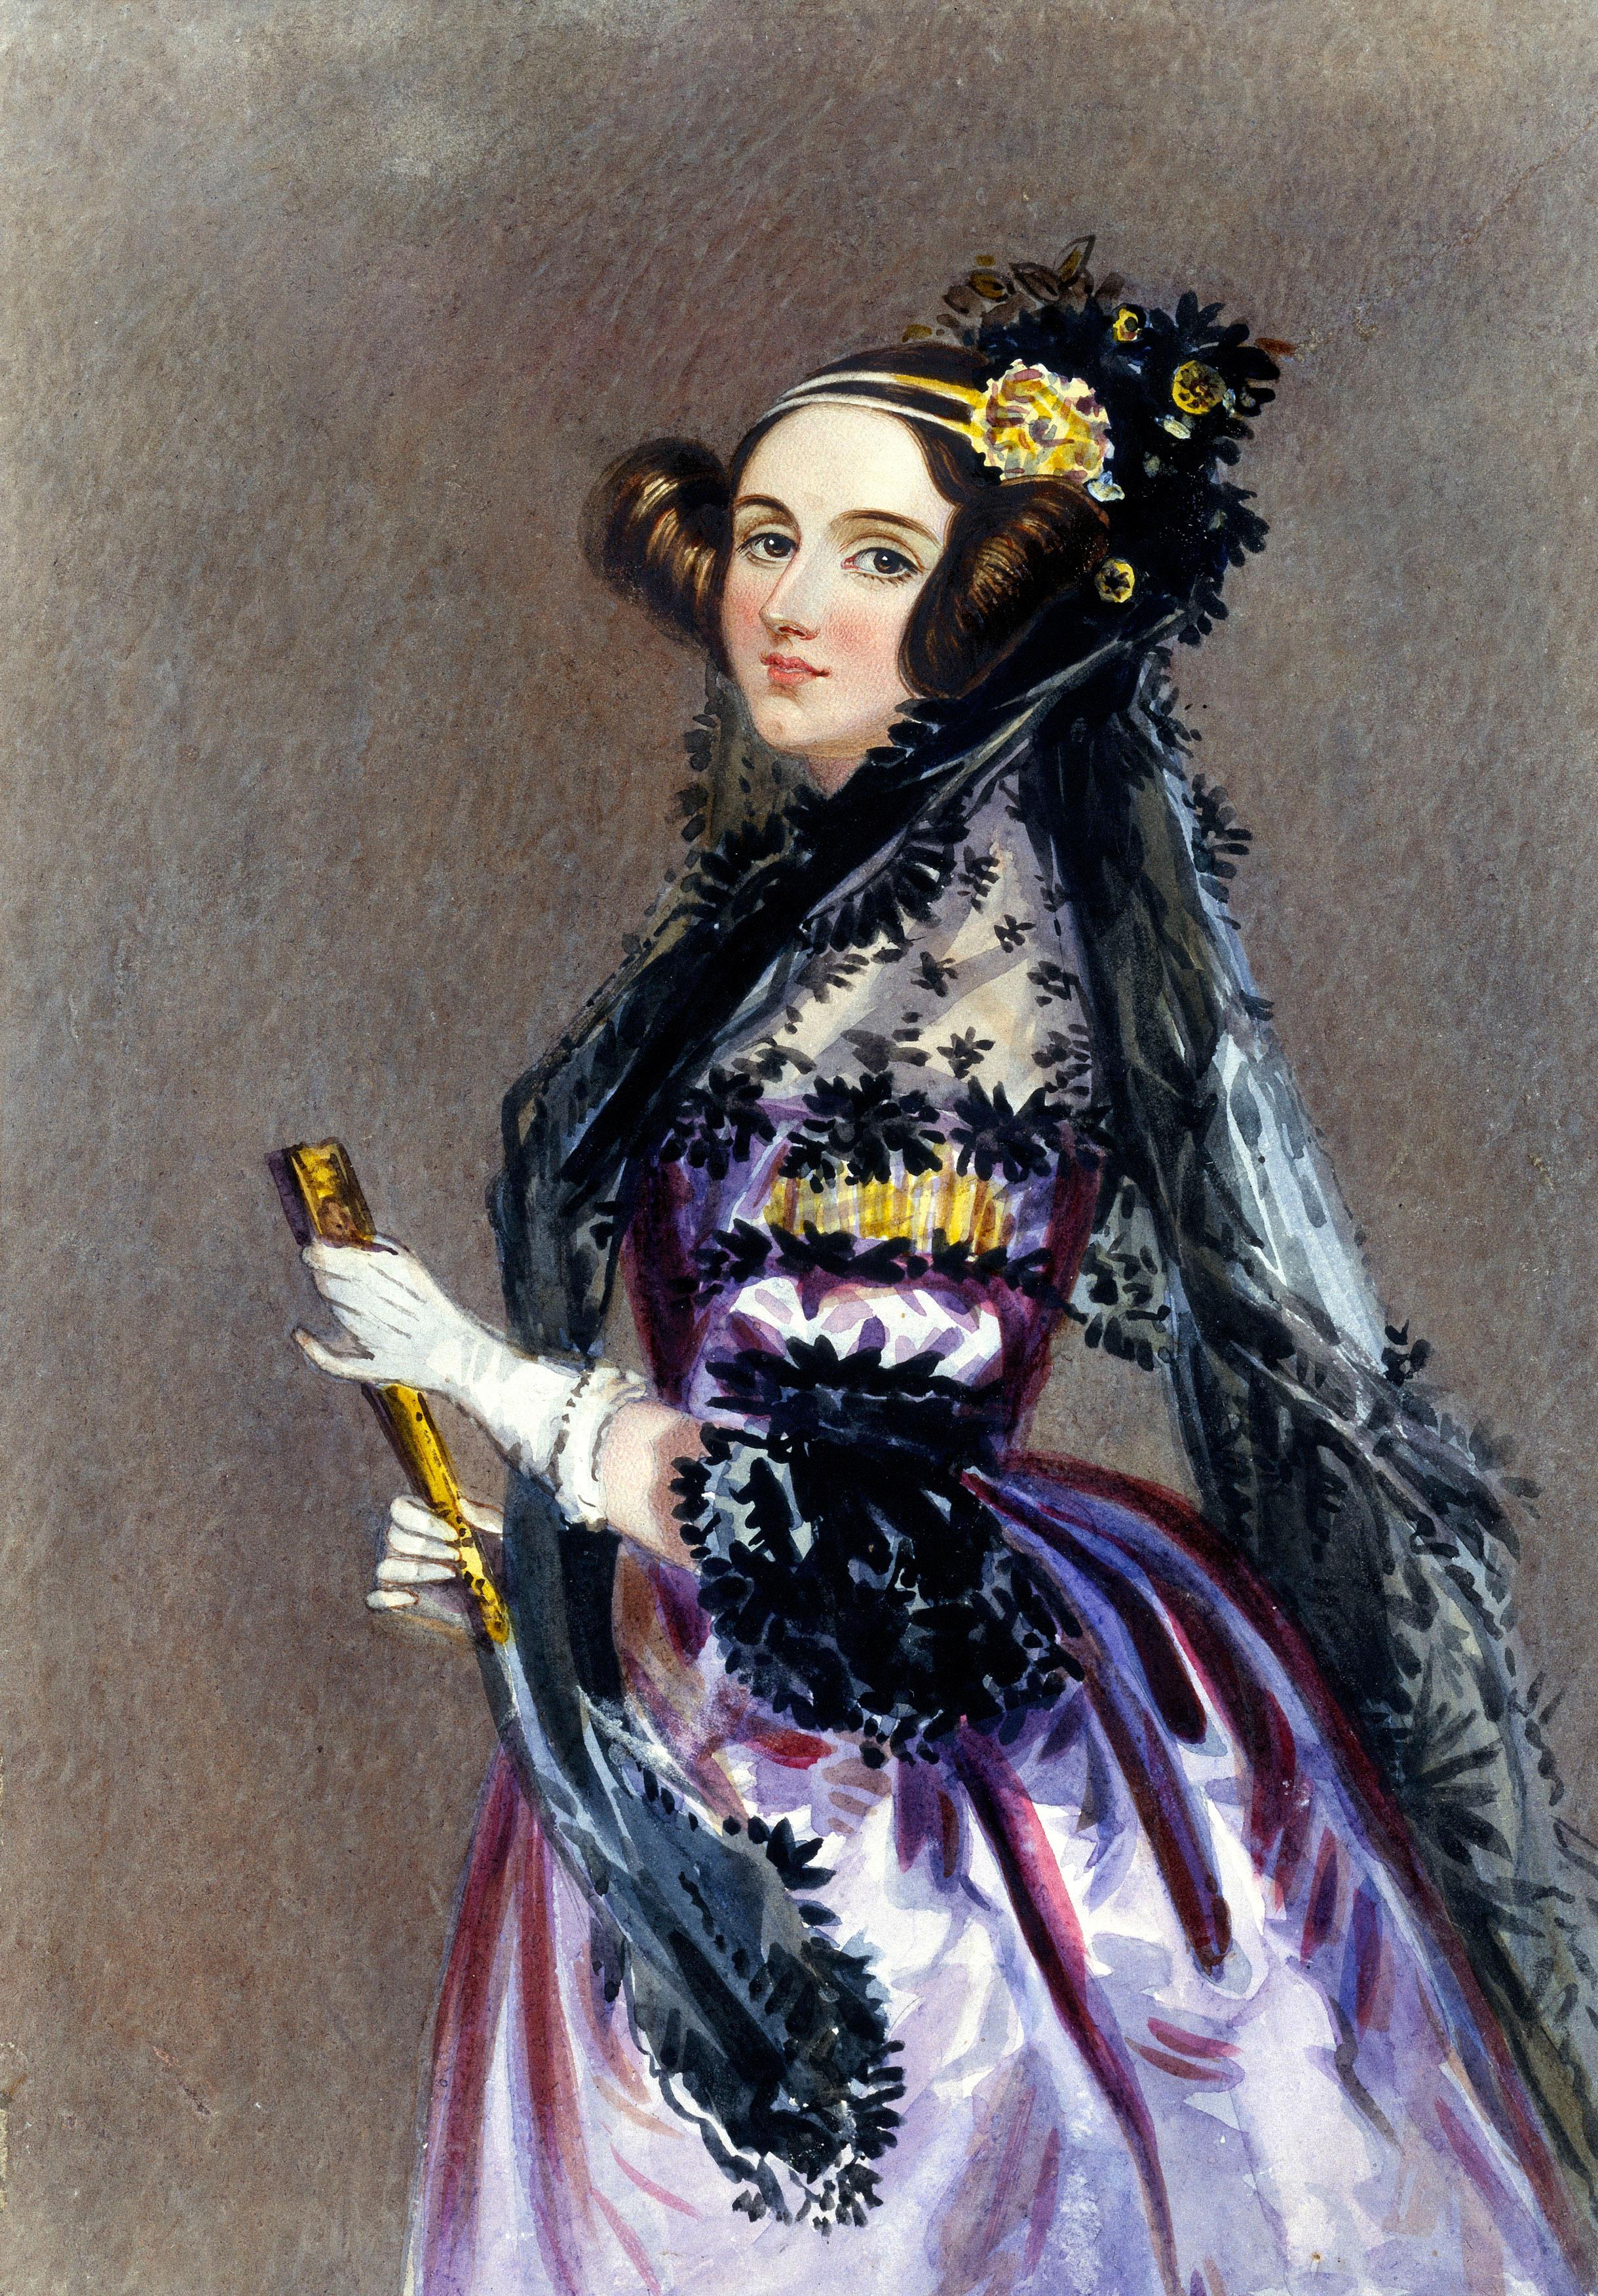 Ada, Countess of Lovelace